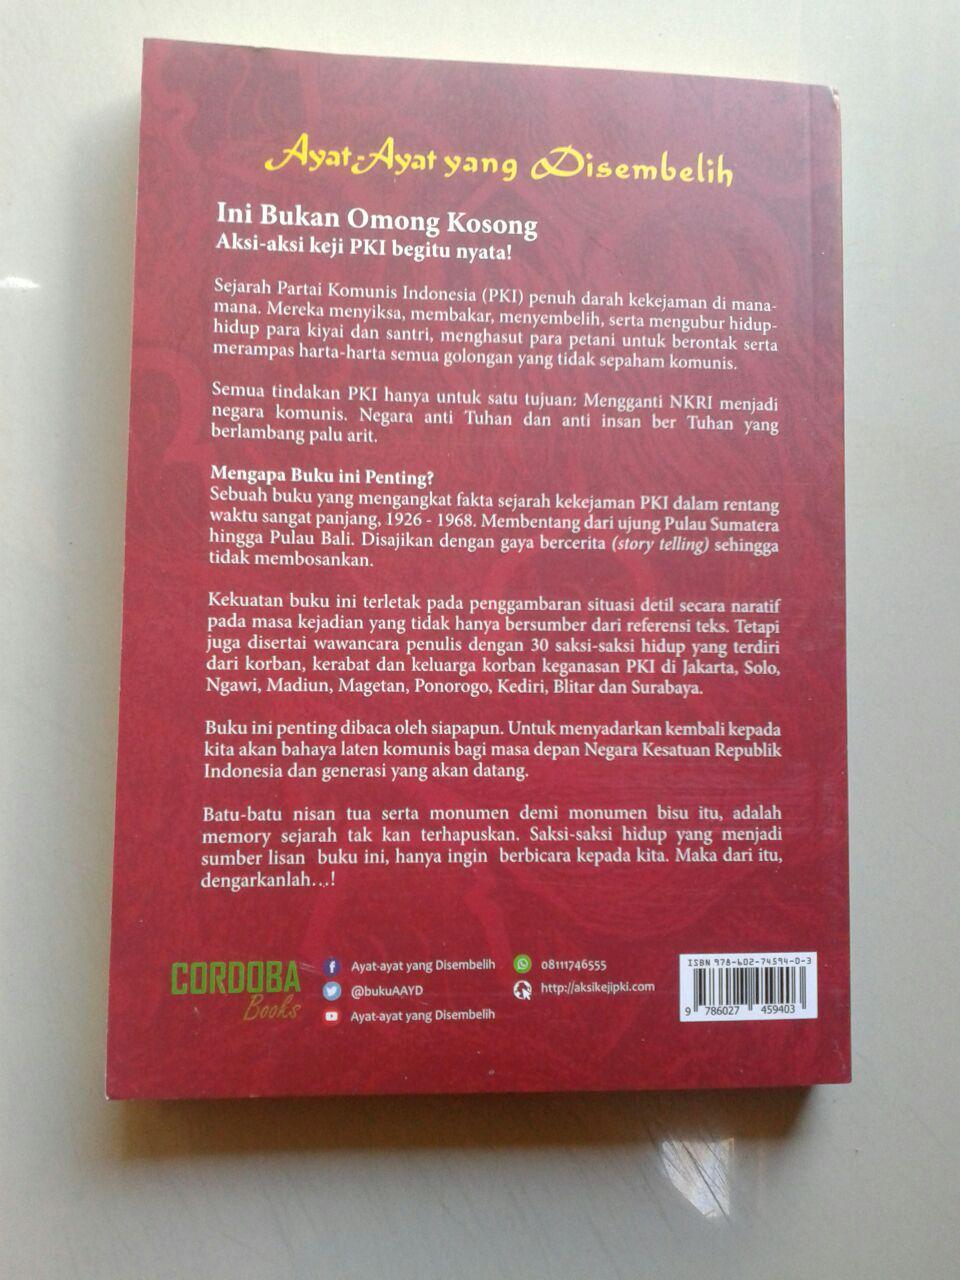 Buku Ayat Ayat Allah Yang Disembelih Sejarah Banjir Darah Para Kyai cover